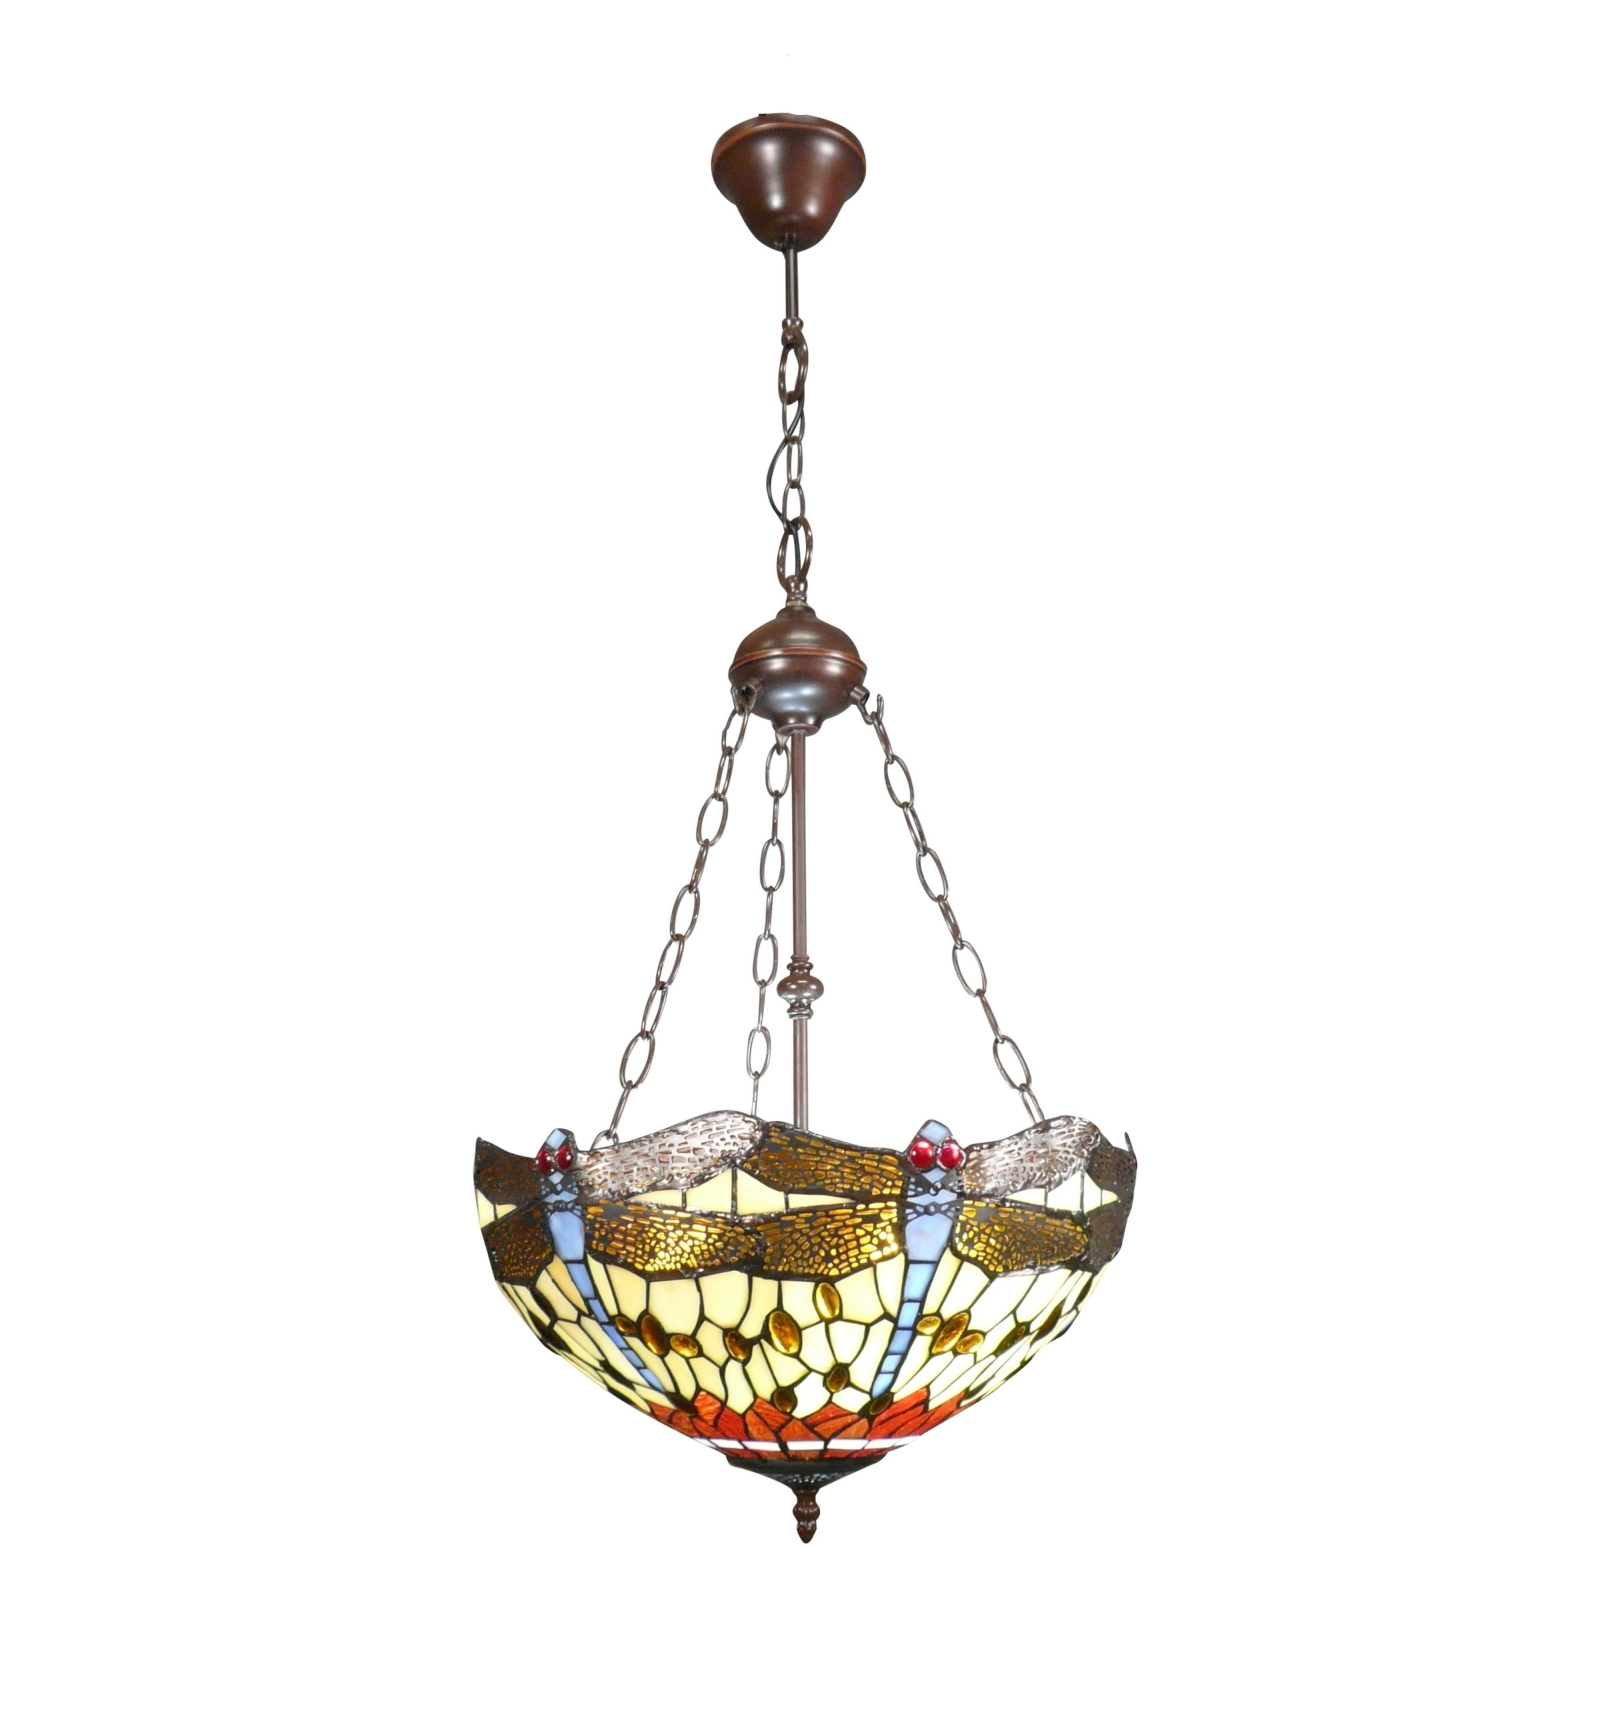 Dragonfly Inverted Tiffany Ceiling Light Birmingham Tiffany Lamps